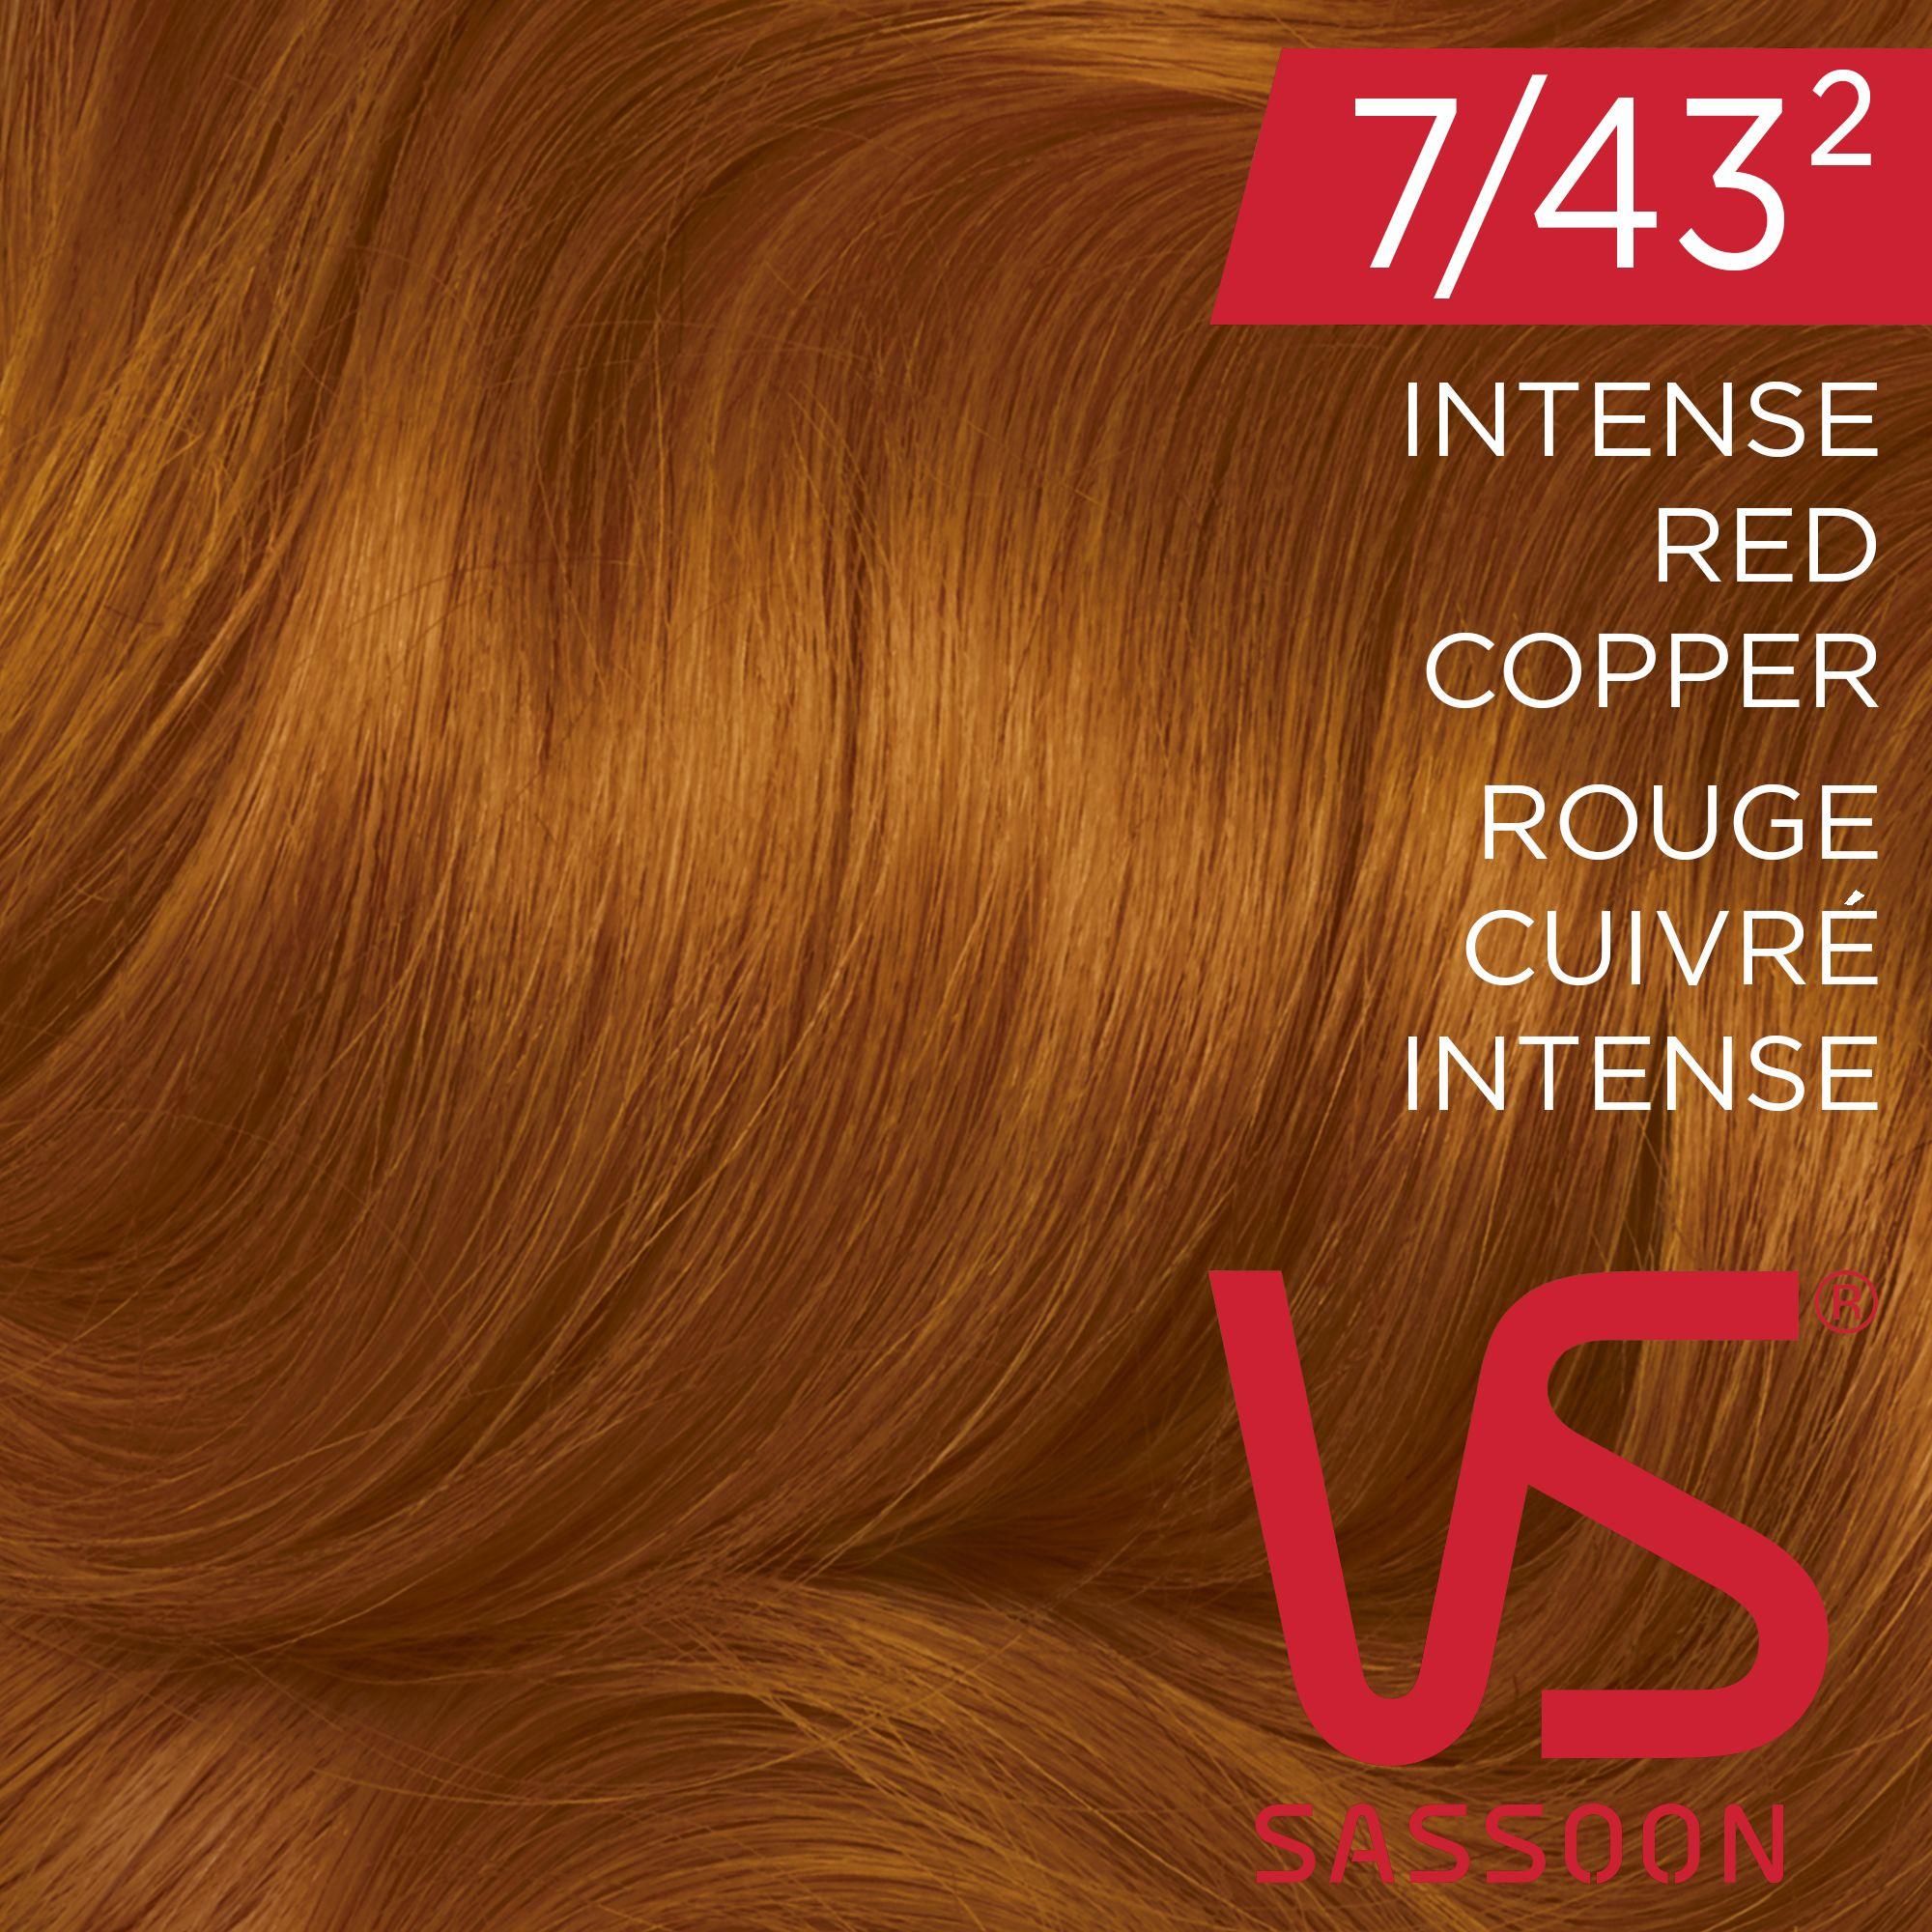 Diy copper hair color vidal sassoon salonist 7432 intense red diy copper hair color vidal sassoon salonist 7432 intense red copper nvjuhfo Image collections